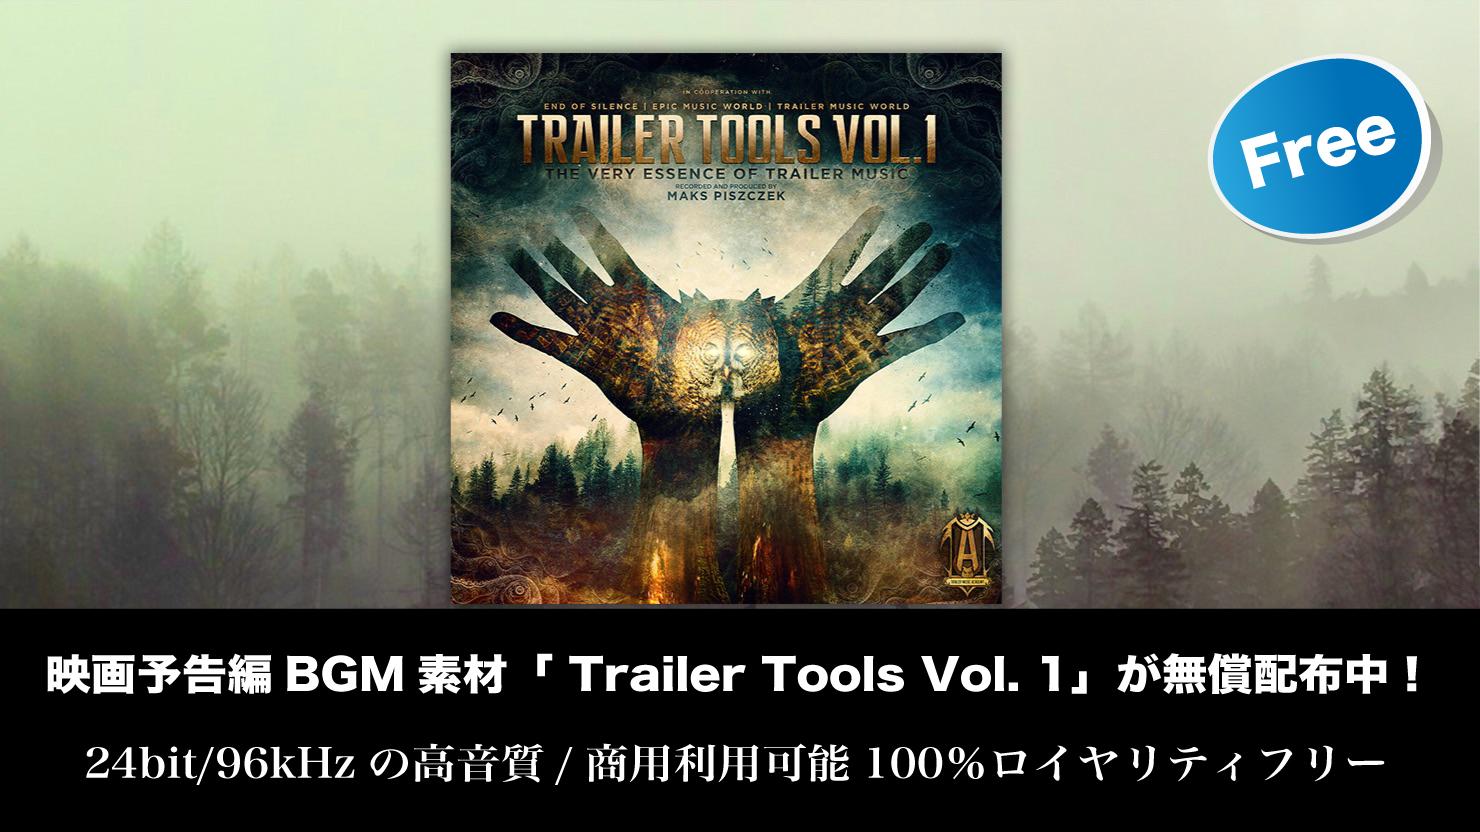 trailer-tools-vol_1_free